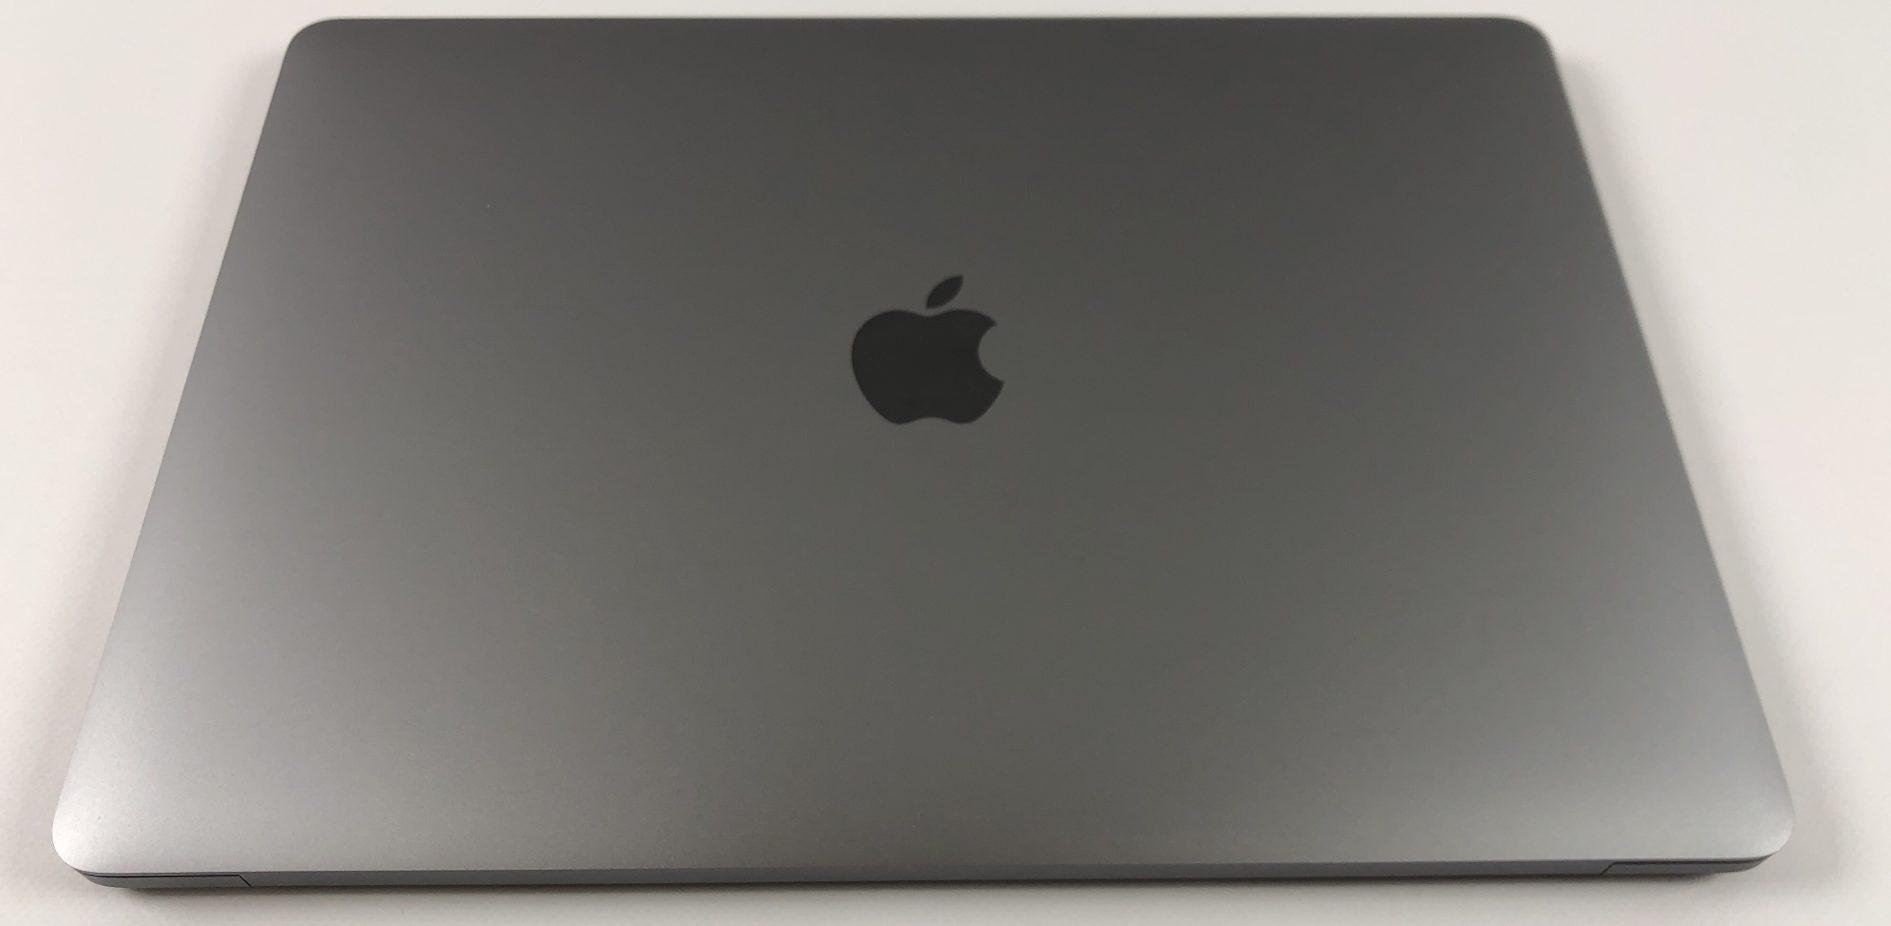 "MacBook Pro 13"" 2TBT Mid 2020 (Intel Quad-Core i5 1.4 GHz 8 GB RAM 256 GB SSD), Space Gray, Intel Quad-Core i5 1.4 GHz, 8 GB RAM, 256 GB SSD, imagen 3"